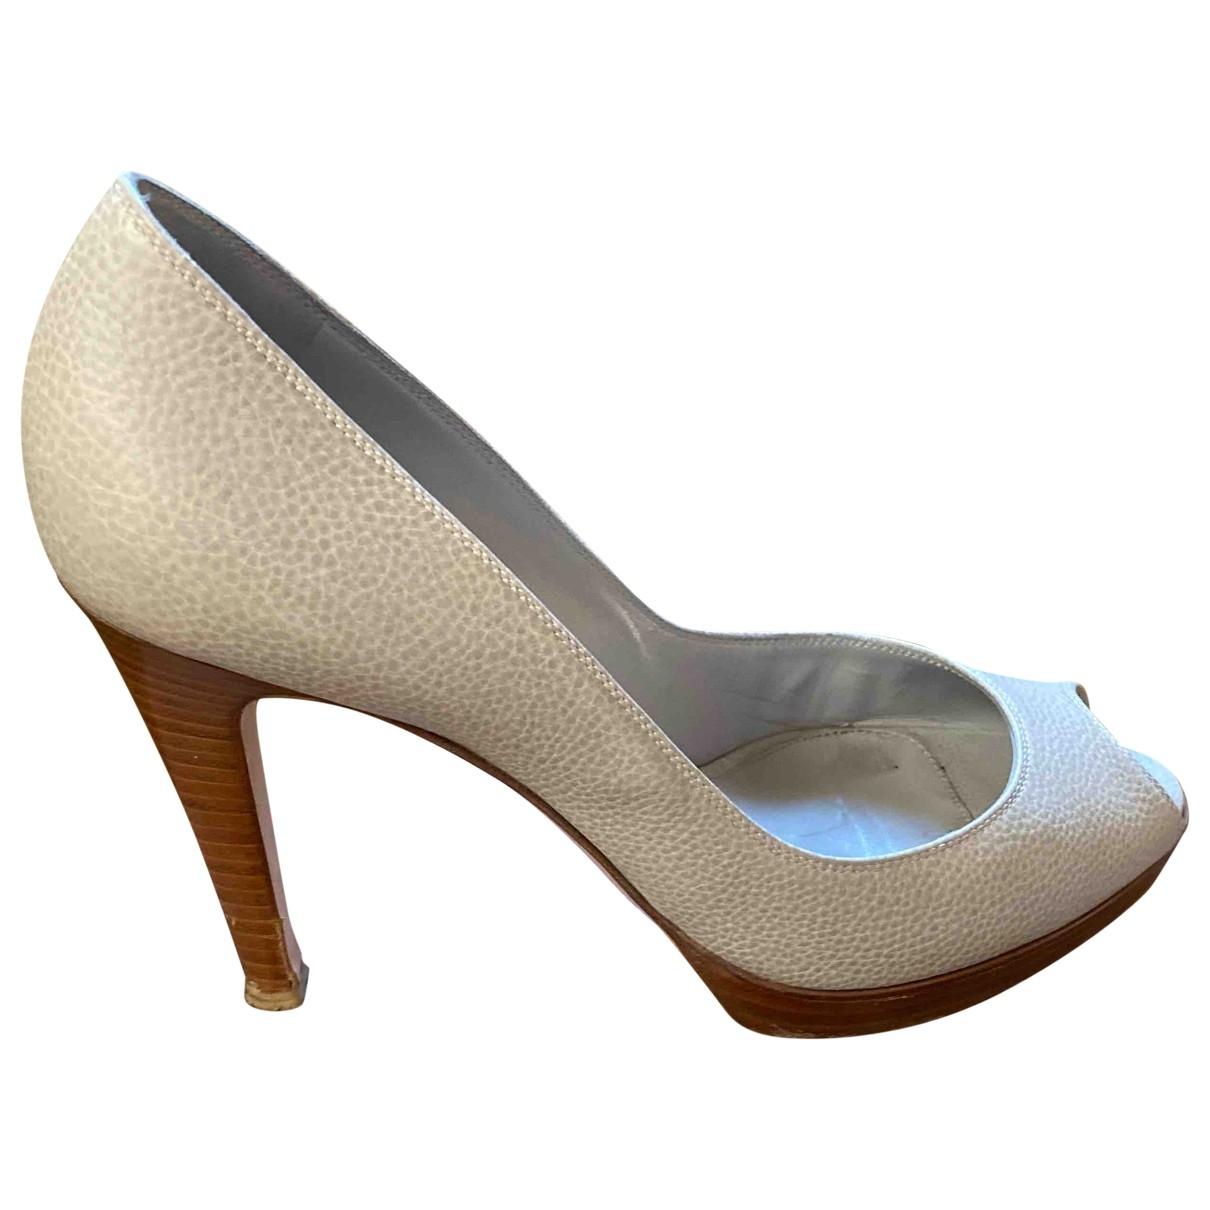 Gianvito Rossi \N Grey Leather Heels for Women 40 EU